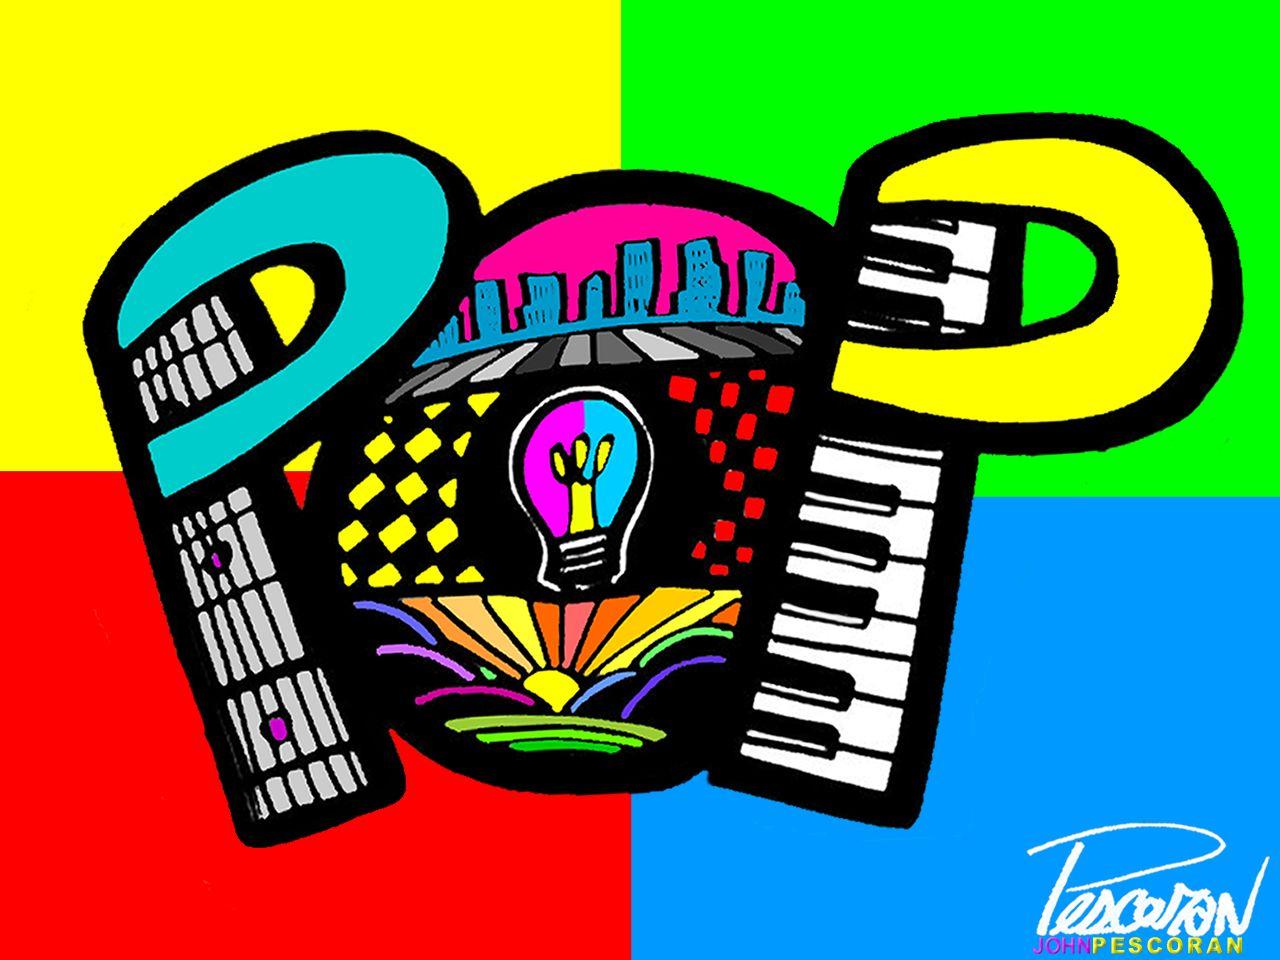 Pop Art Wallpaper JOHN PESCORAN   Pop Art Wallpaper 30799426 1280x960